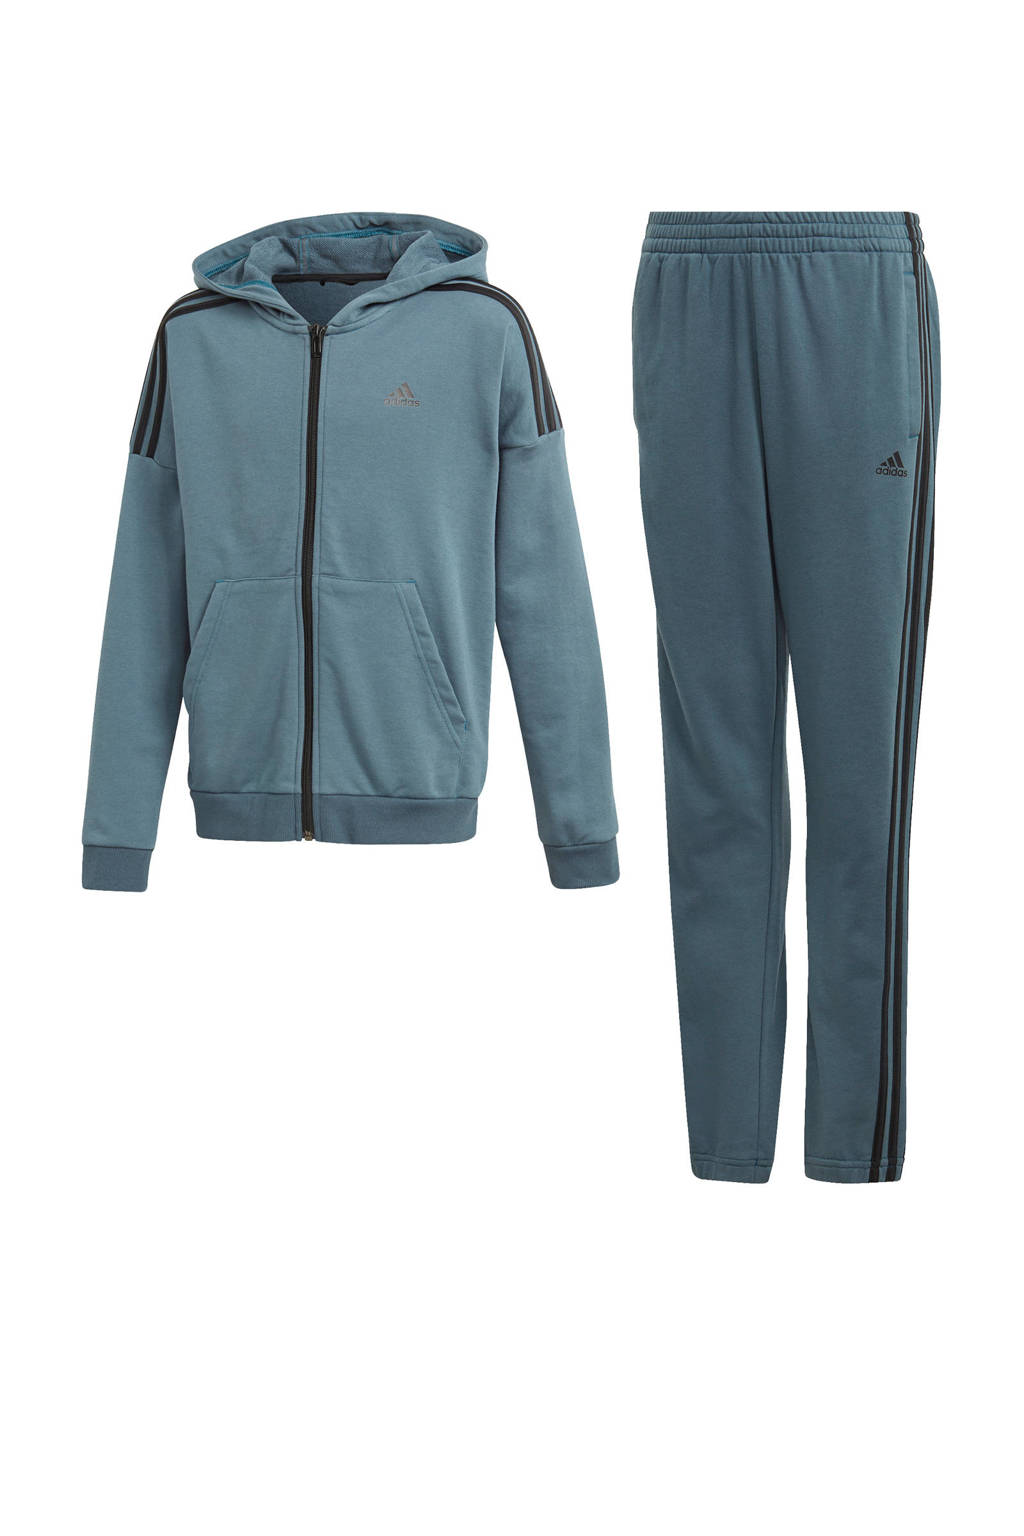 adidas Performance   joggingpak grijs/blauw, Grijs/blauw